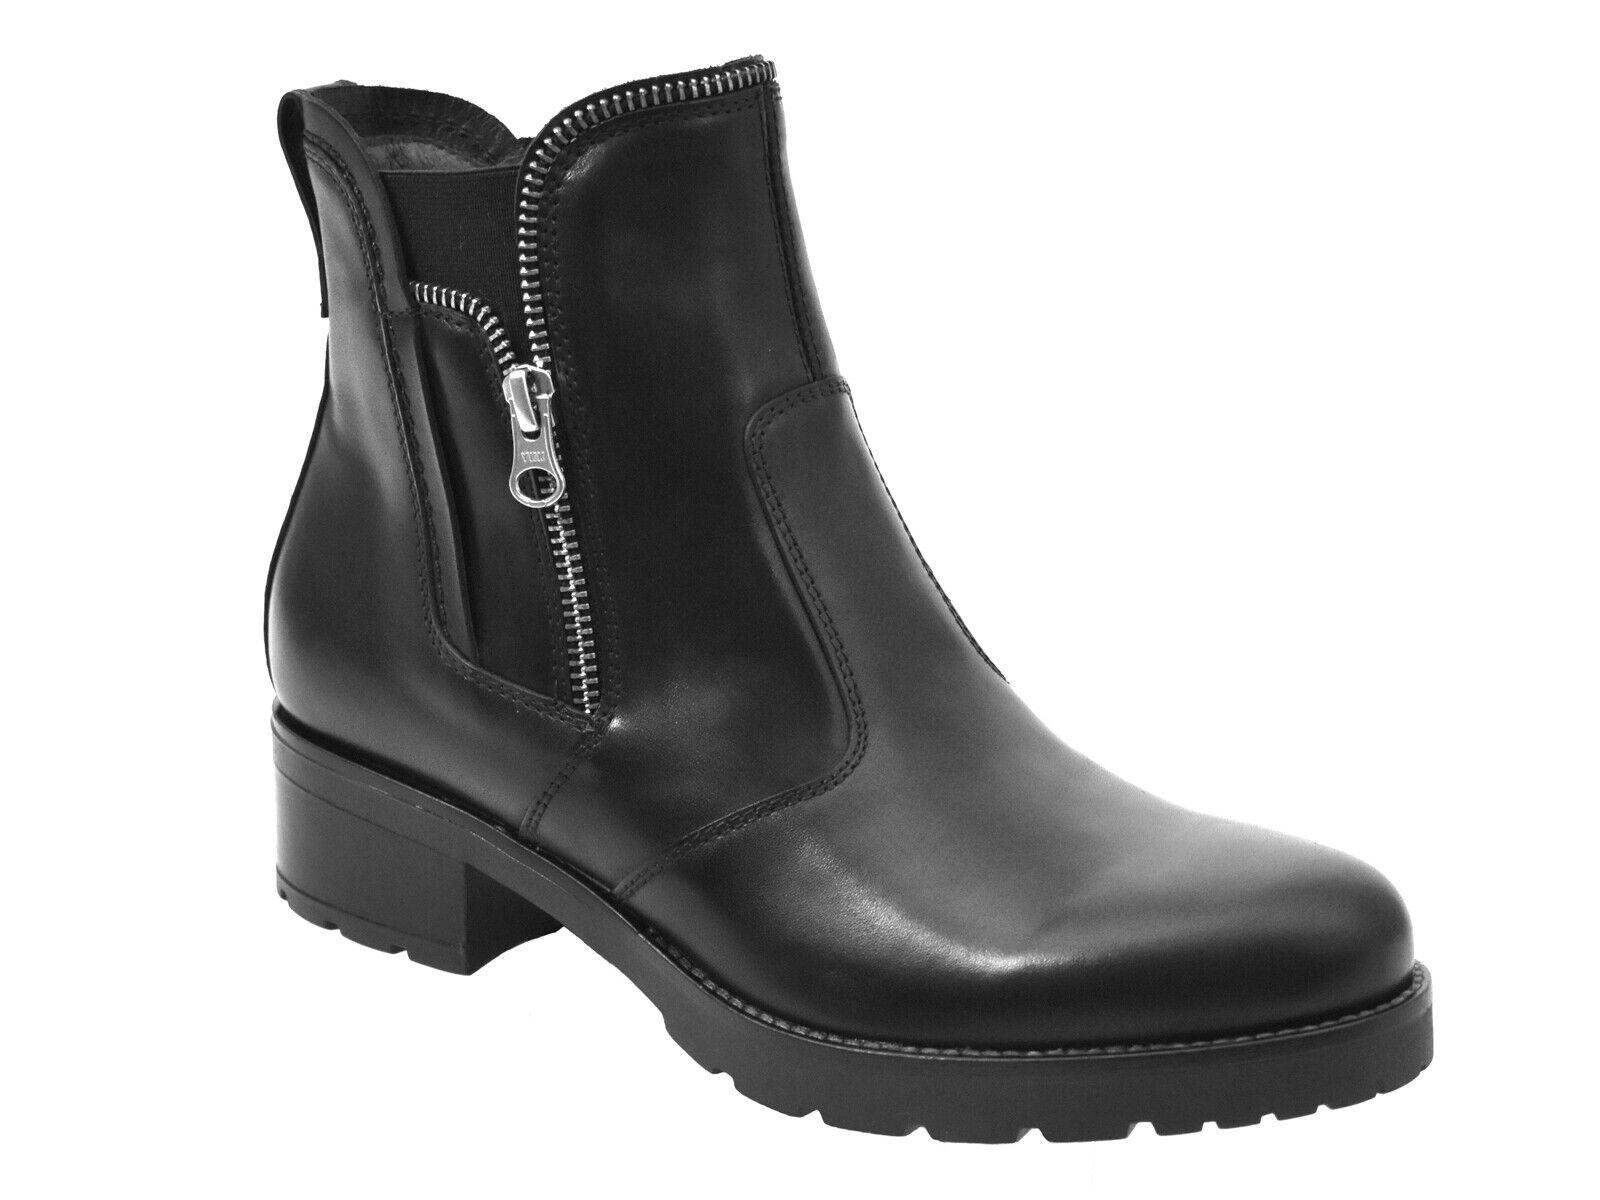 Stiefel BASSI damen schwarz GIARDINI INVERNO A807050D 100  TRONCHETTI schwarz